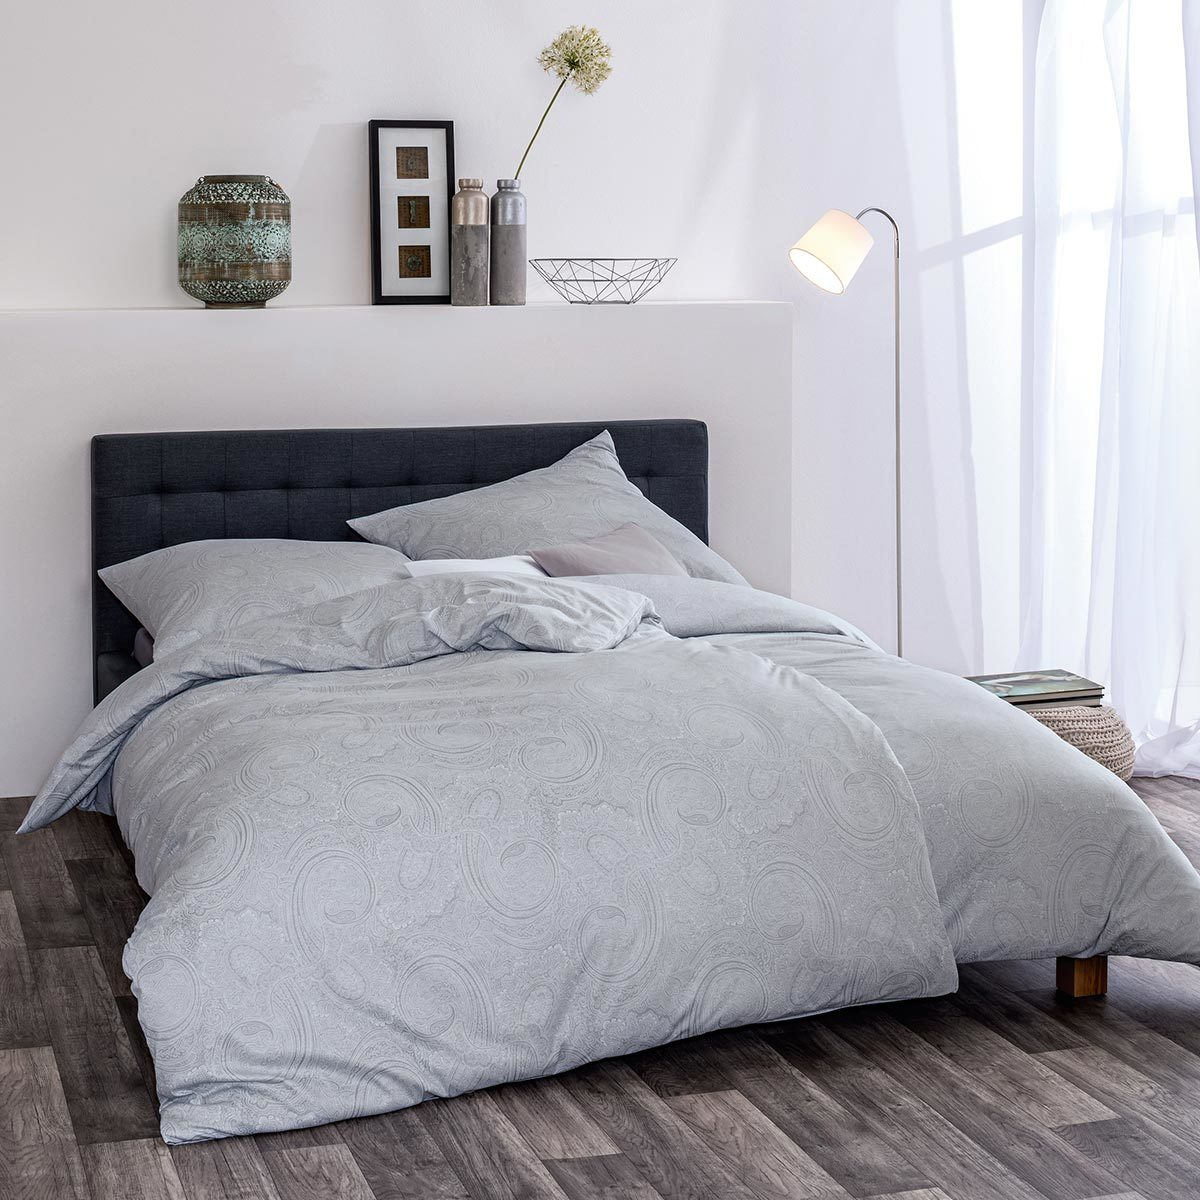 estella mako interlock jersey abby silber g nstig online. Black Bedroom Furniture Sets. Home Design Ideas